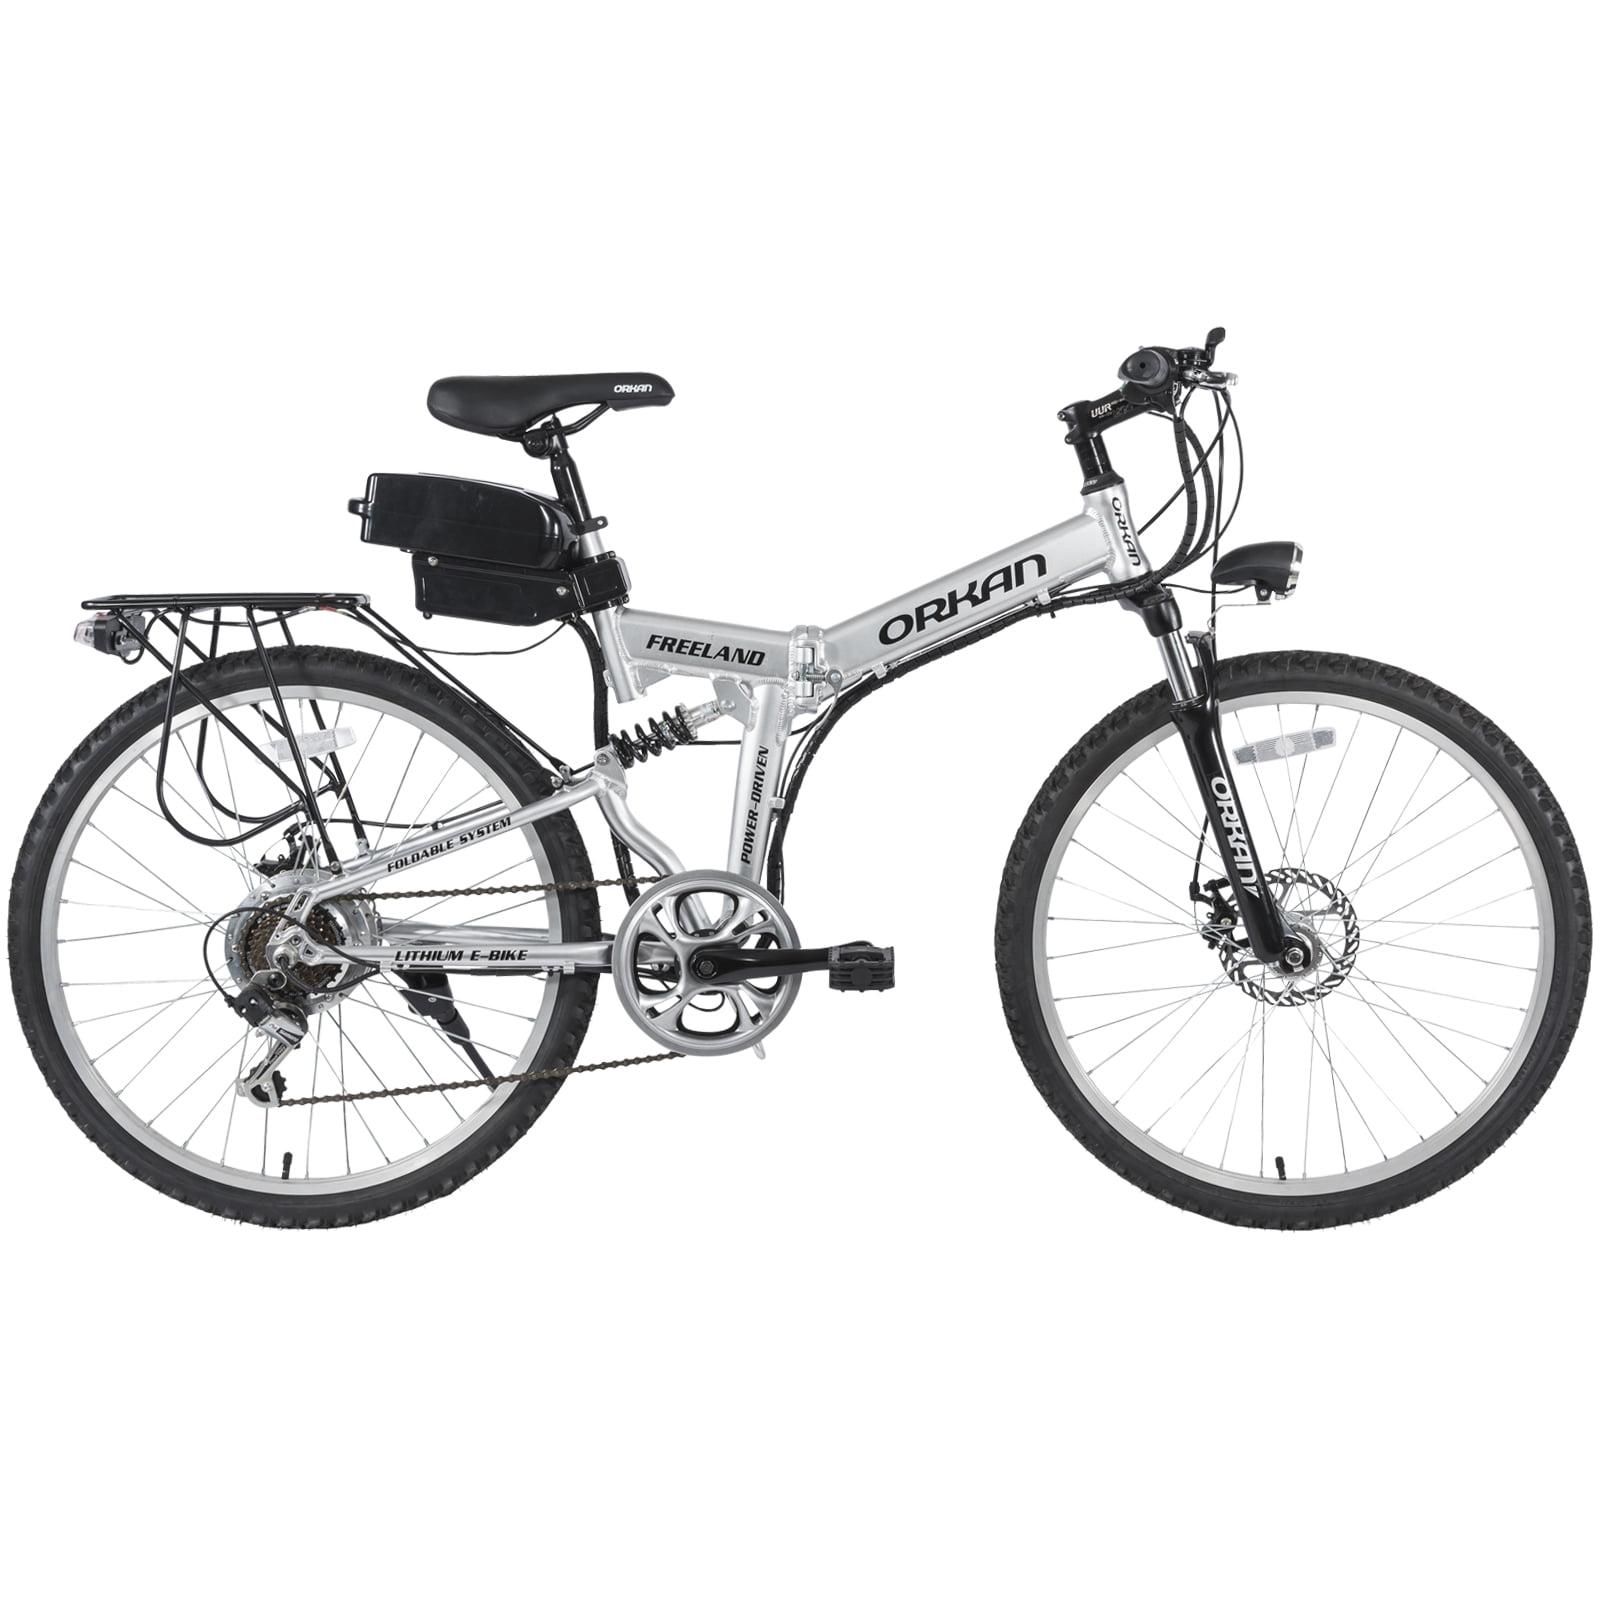 Murtisol 26 Aluminum Electric Bicycle Mountain Bike E Bike 4 Speeds